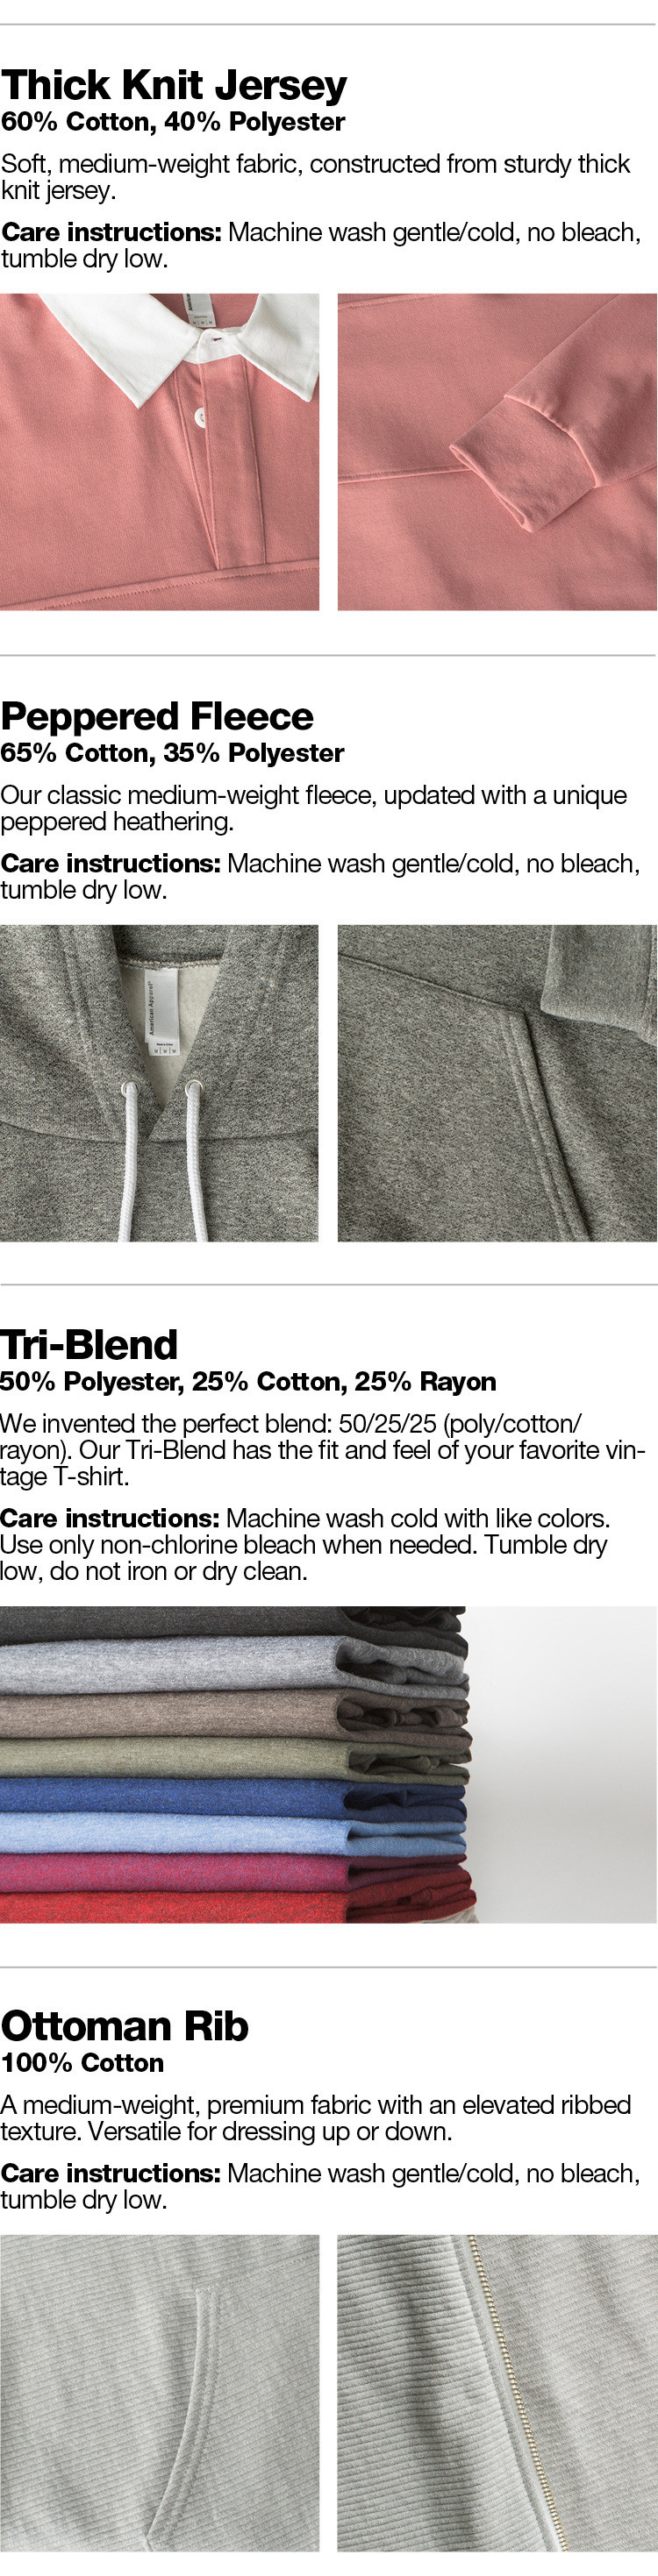 Meet the Fabrics - 2